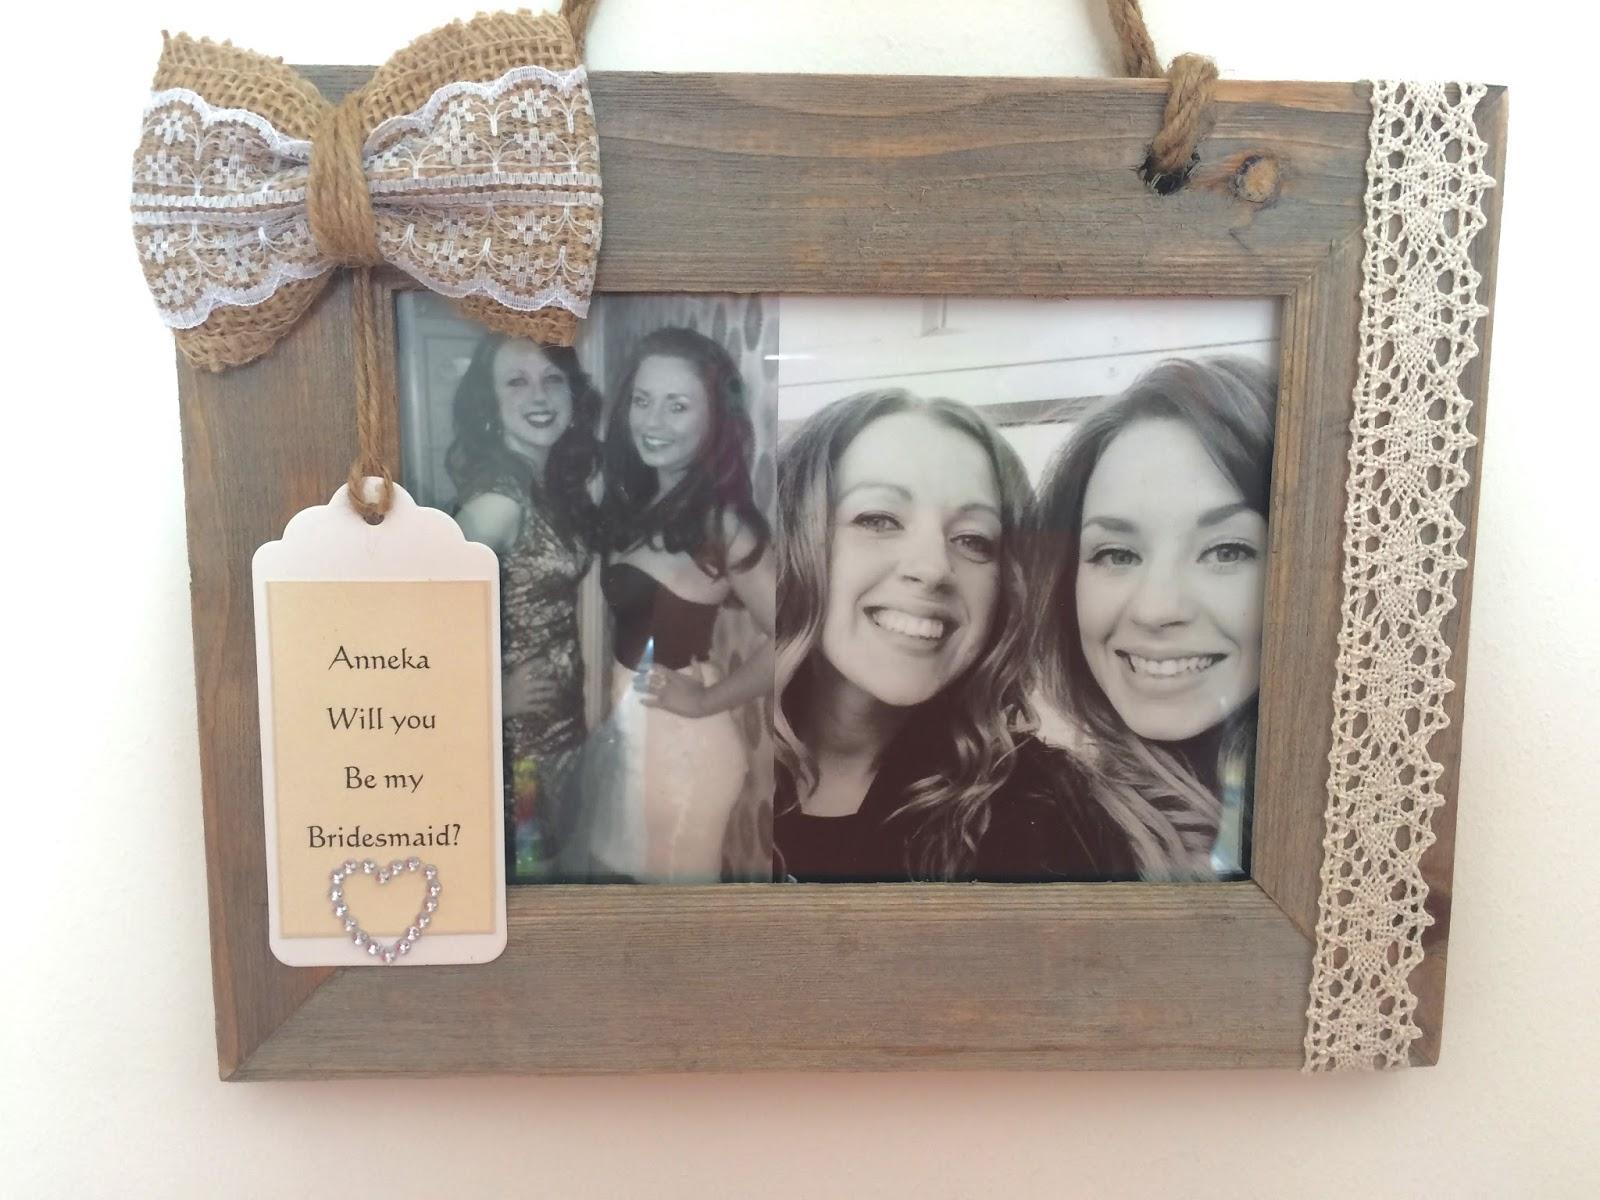 DIY \'Will you be my bridesmaid?\' photo frame - Bella Coco by Sarah-Jayne